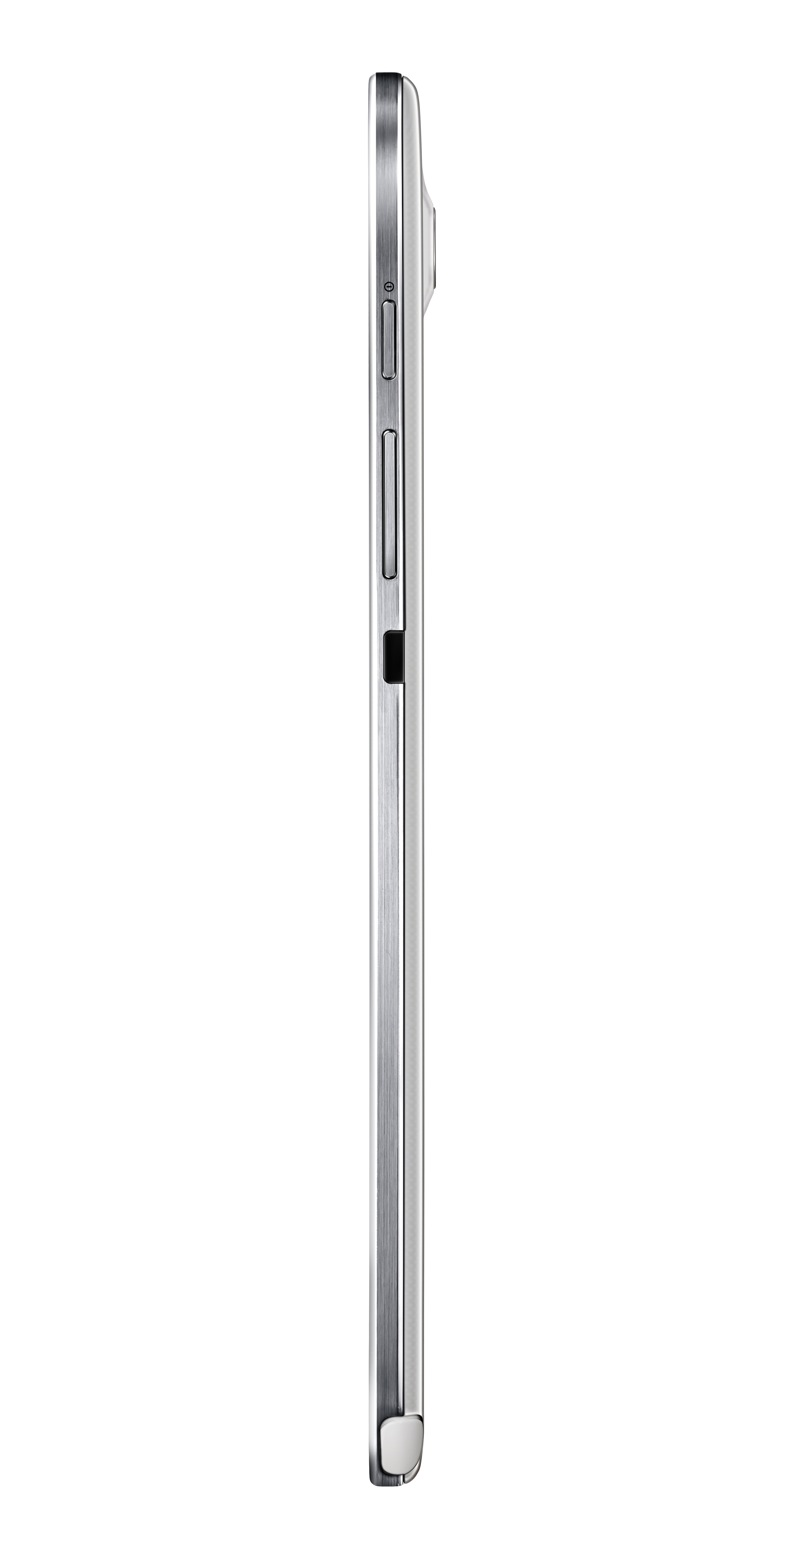 Samsung_Galaxy_Note_8.0_2.jpg